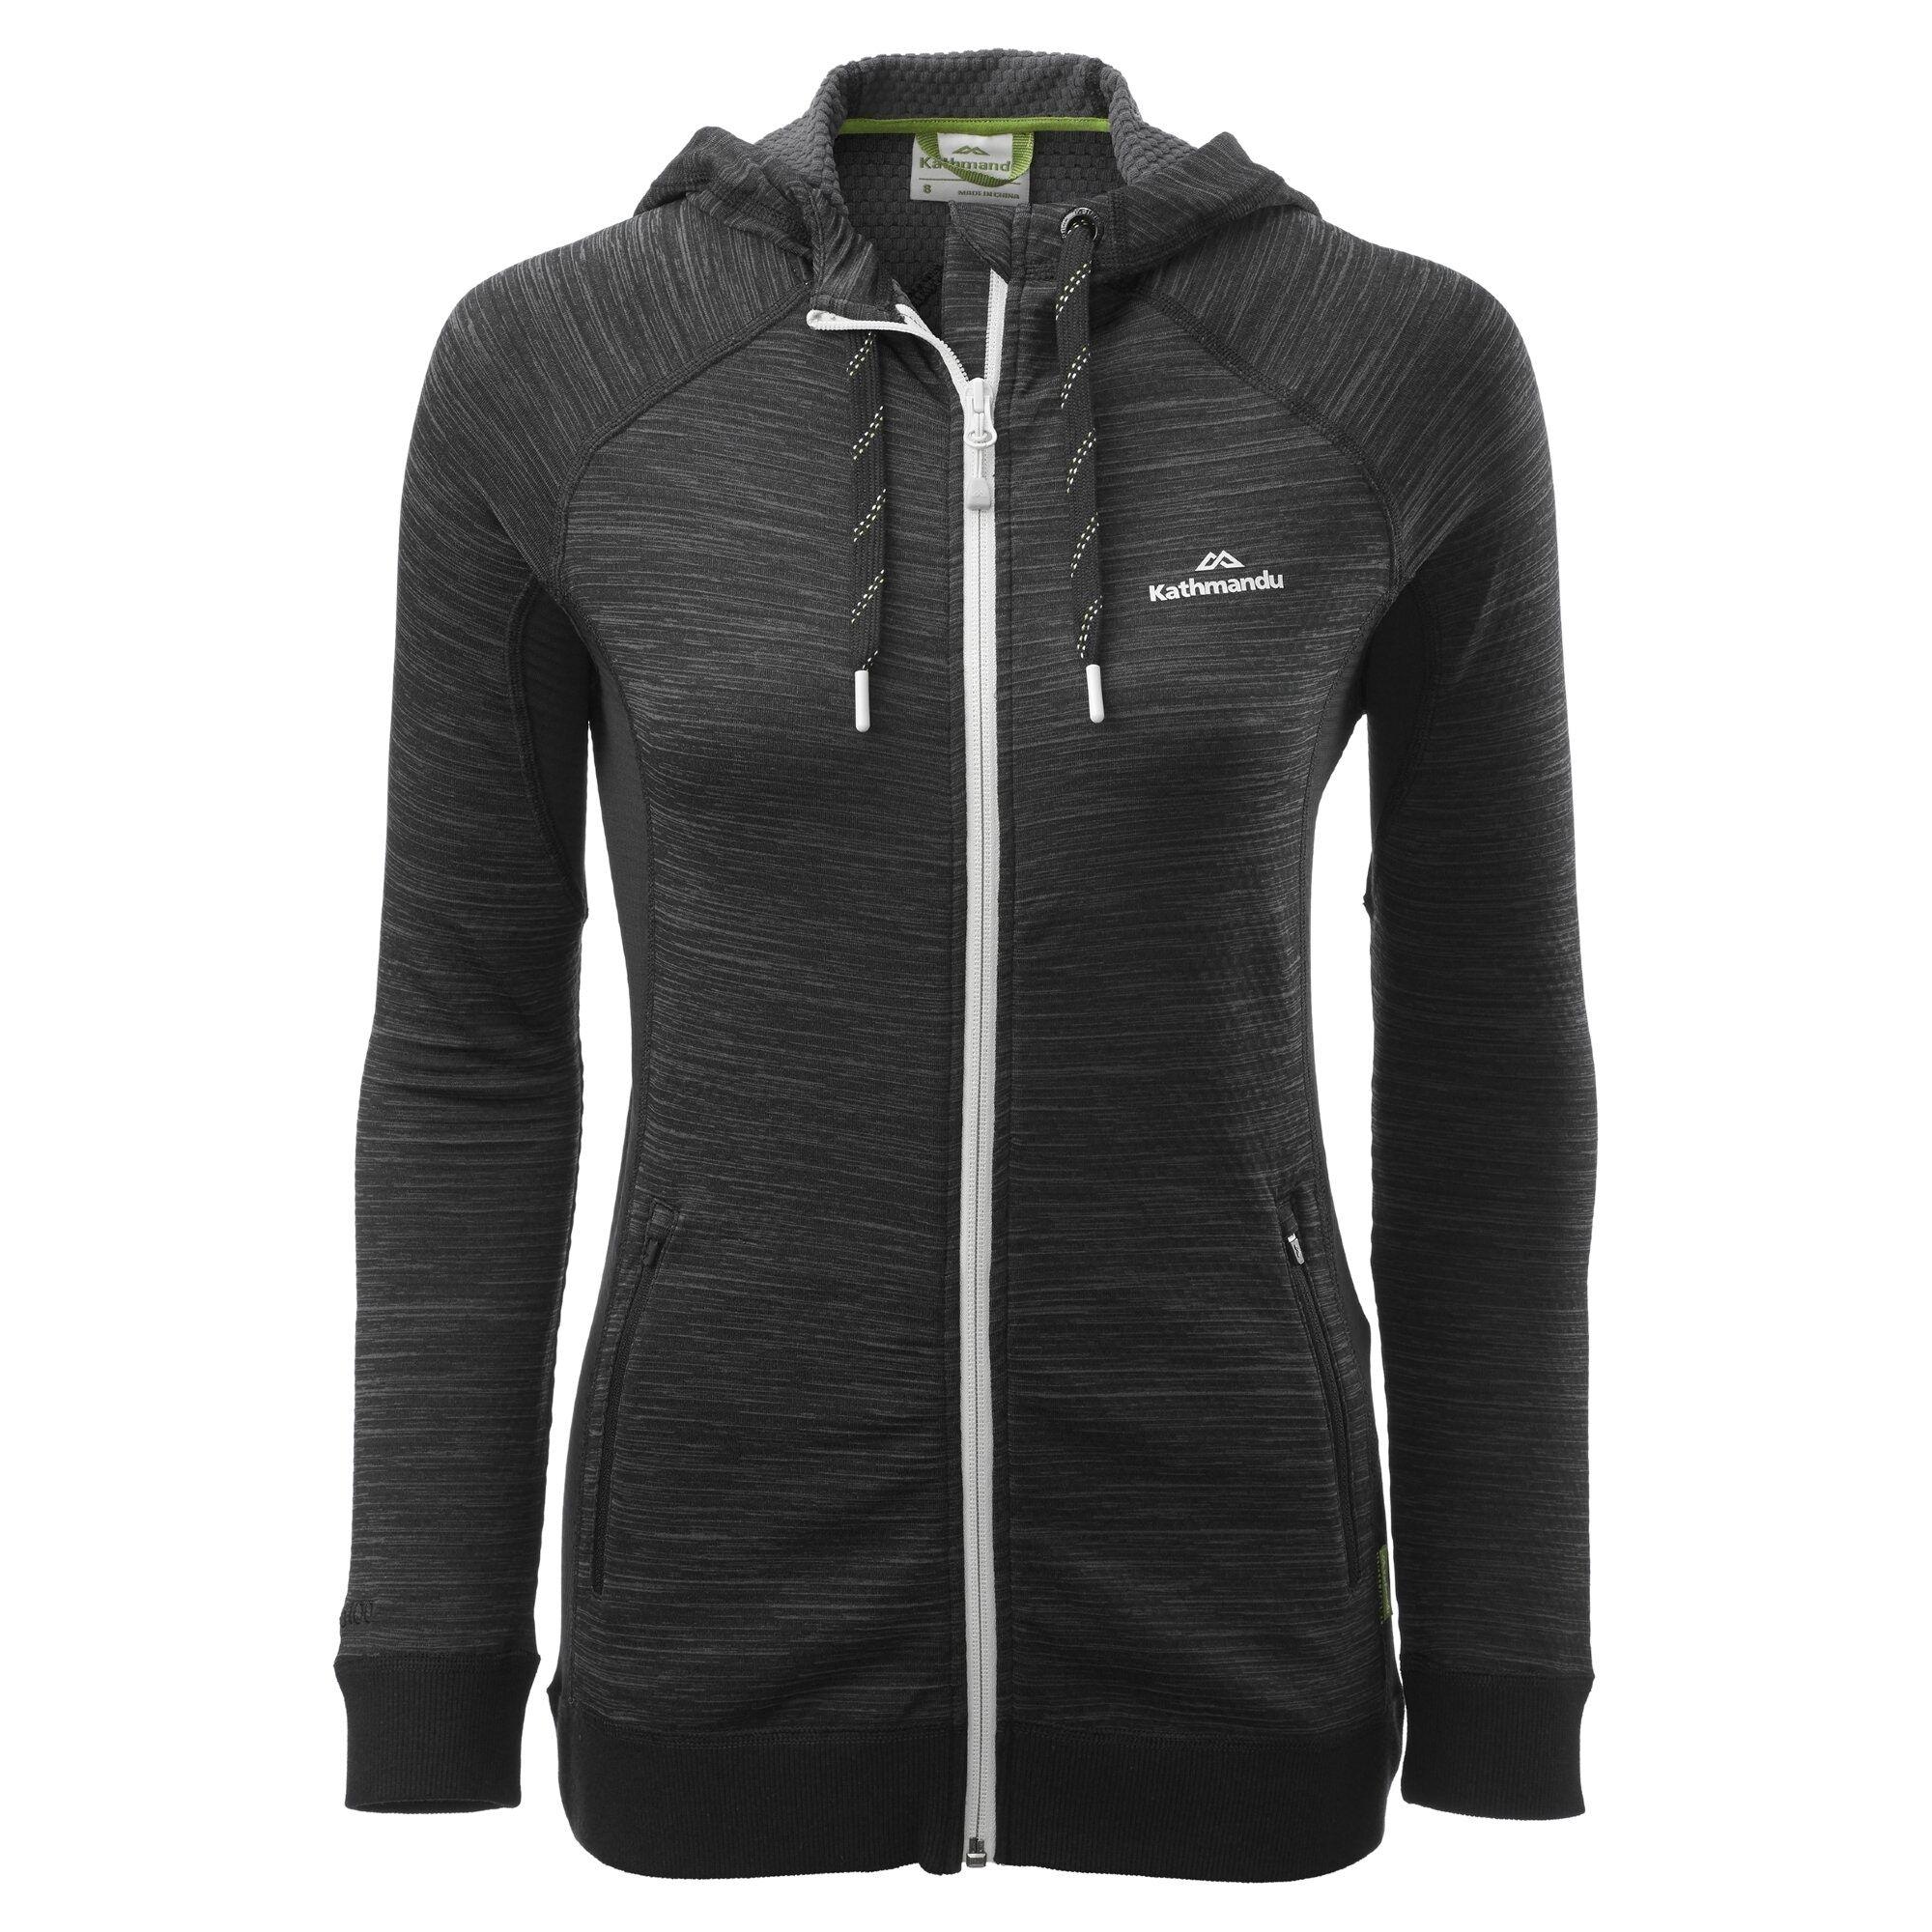 Kathmandu Acota Women's Hooded Fleece Jacket  - Granite Marle/Black - Size: US 12